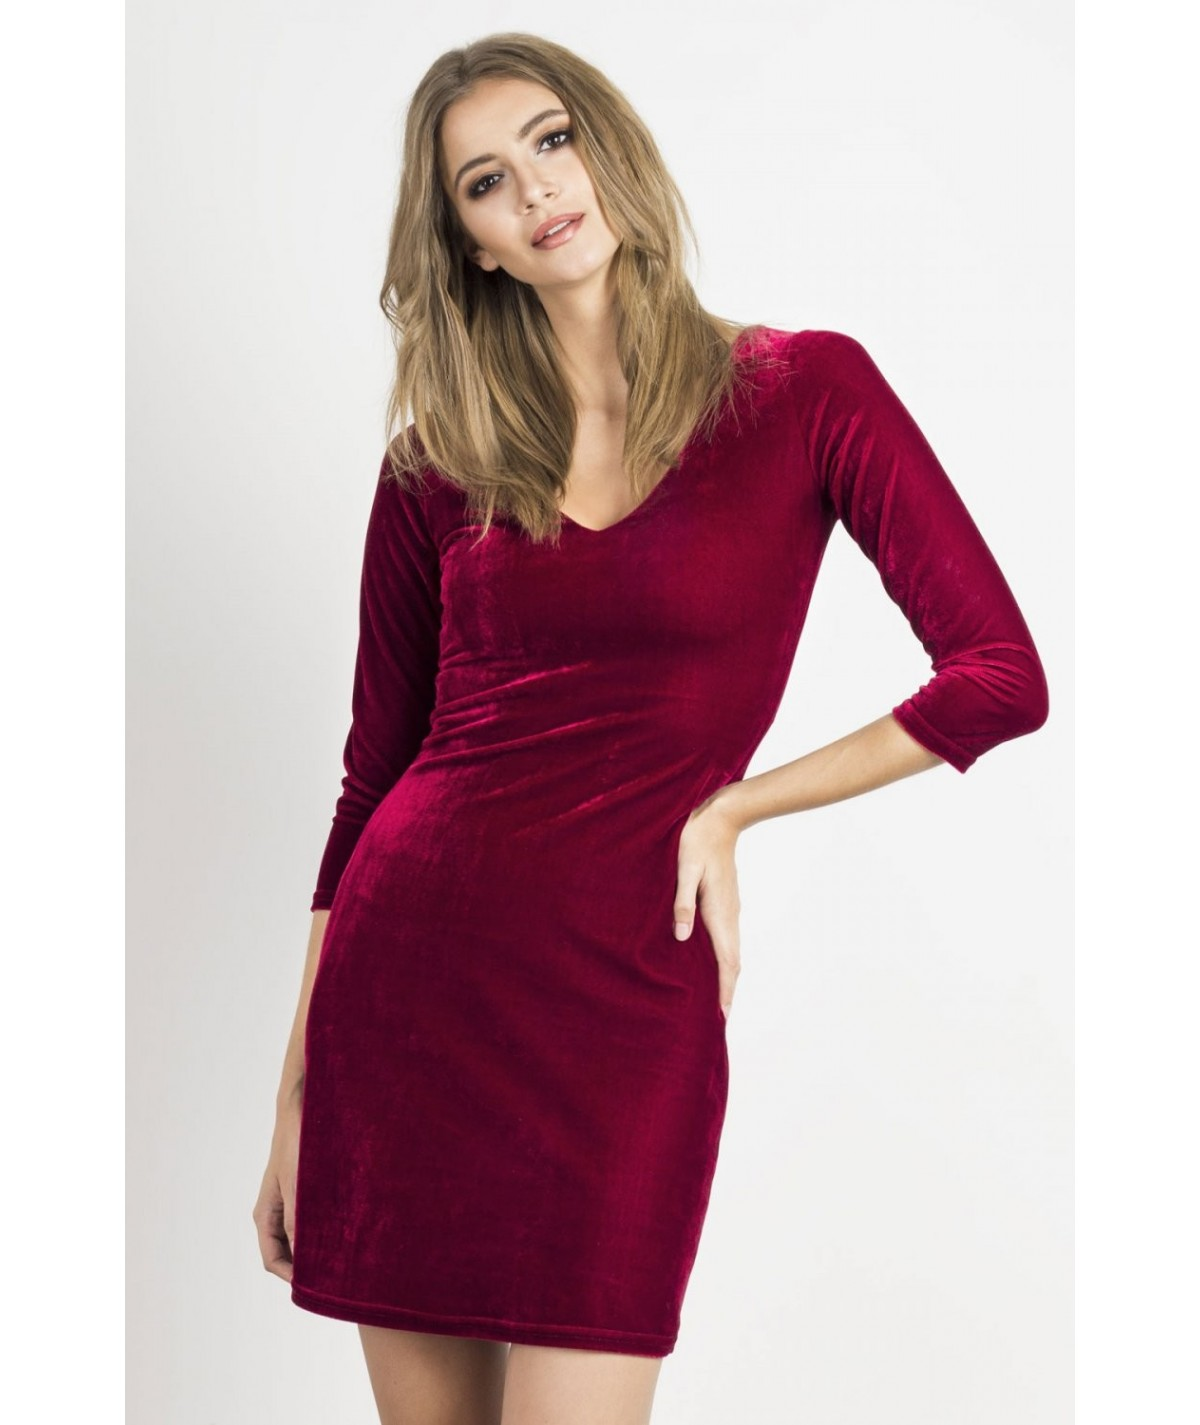 bordowa welurowa sukienka IVON